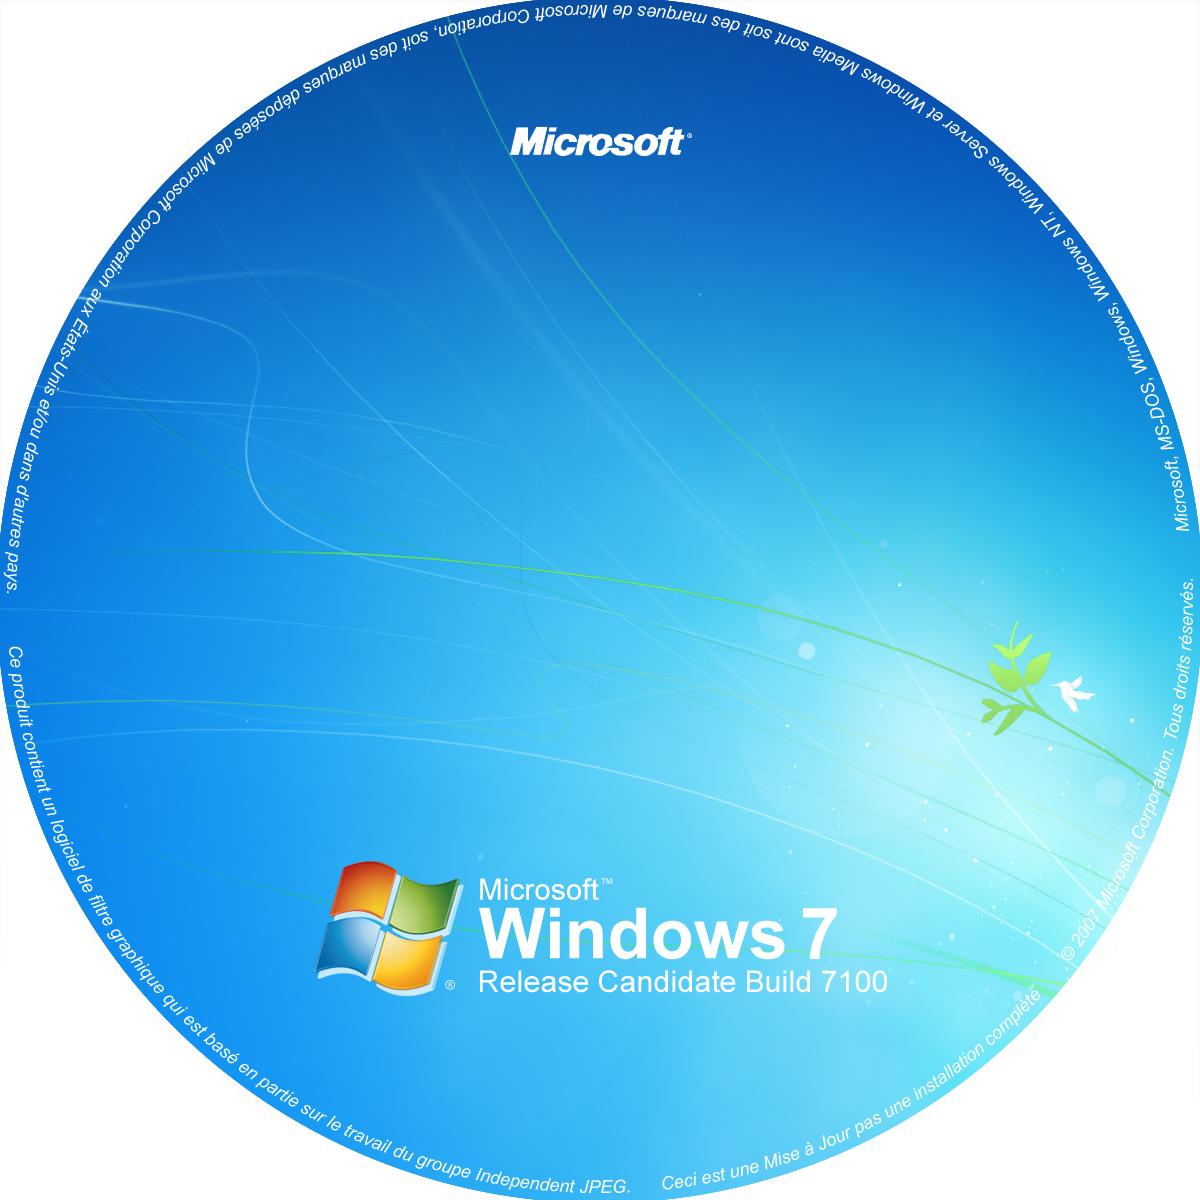 Windows 7 professional sp2 64 bit iso | Windows 7 Service